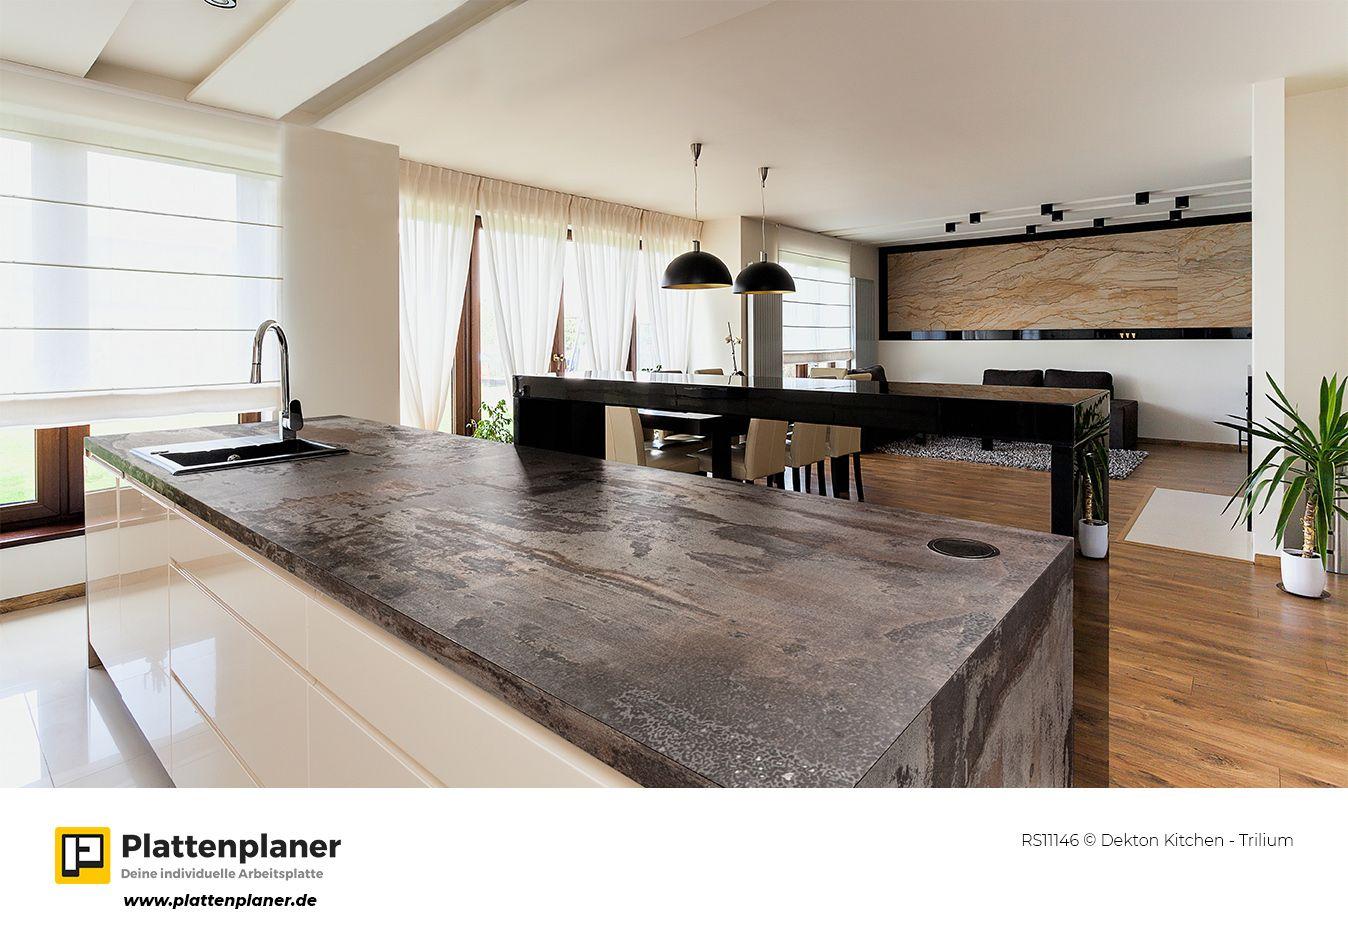 RS11146 © Dekton Kitchen - Trilium #plattenplaner #arbeitsplatte ...